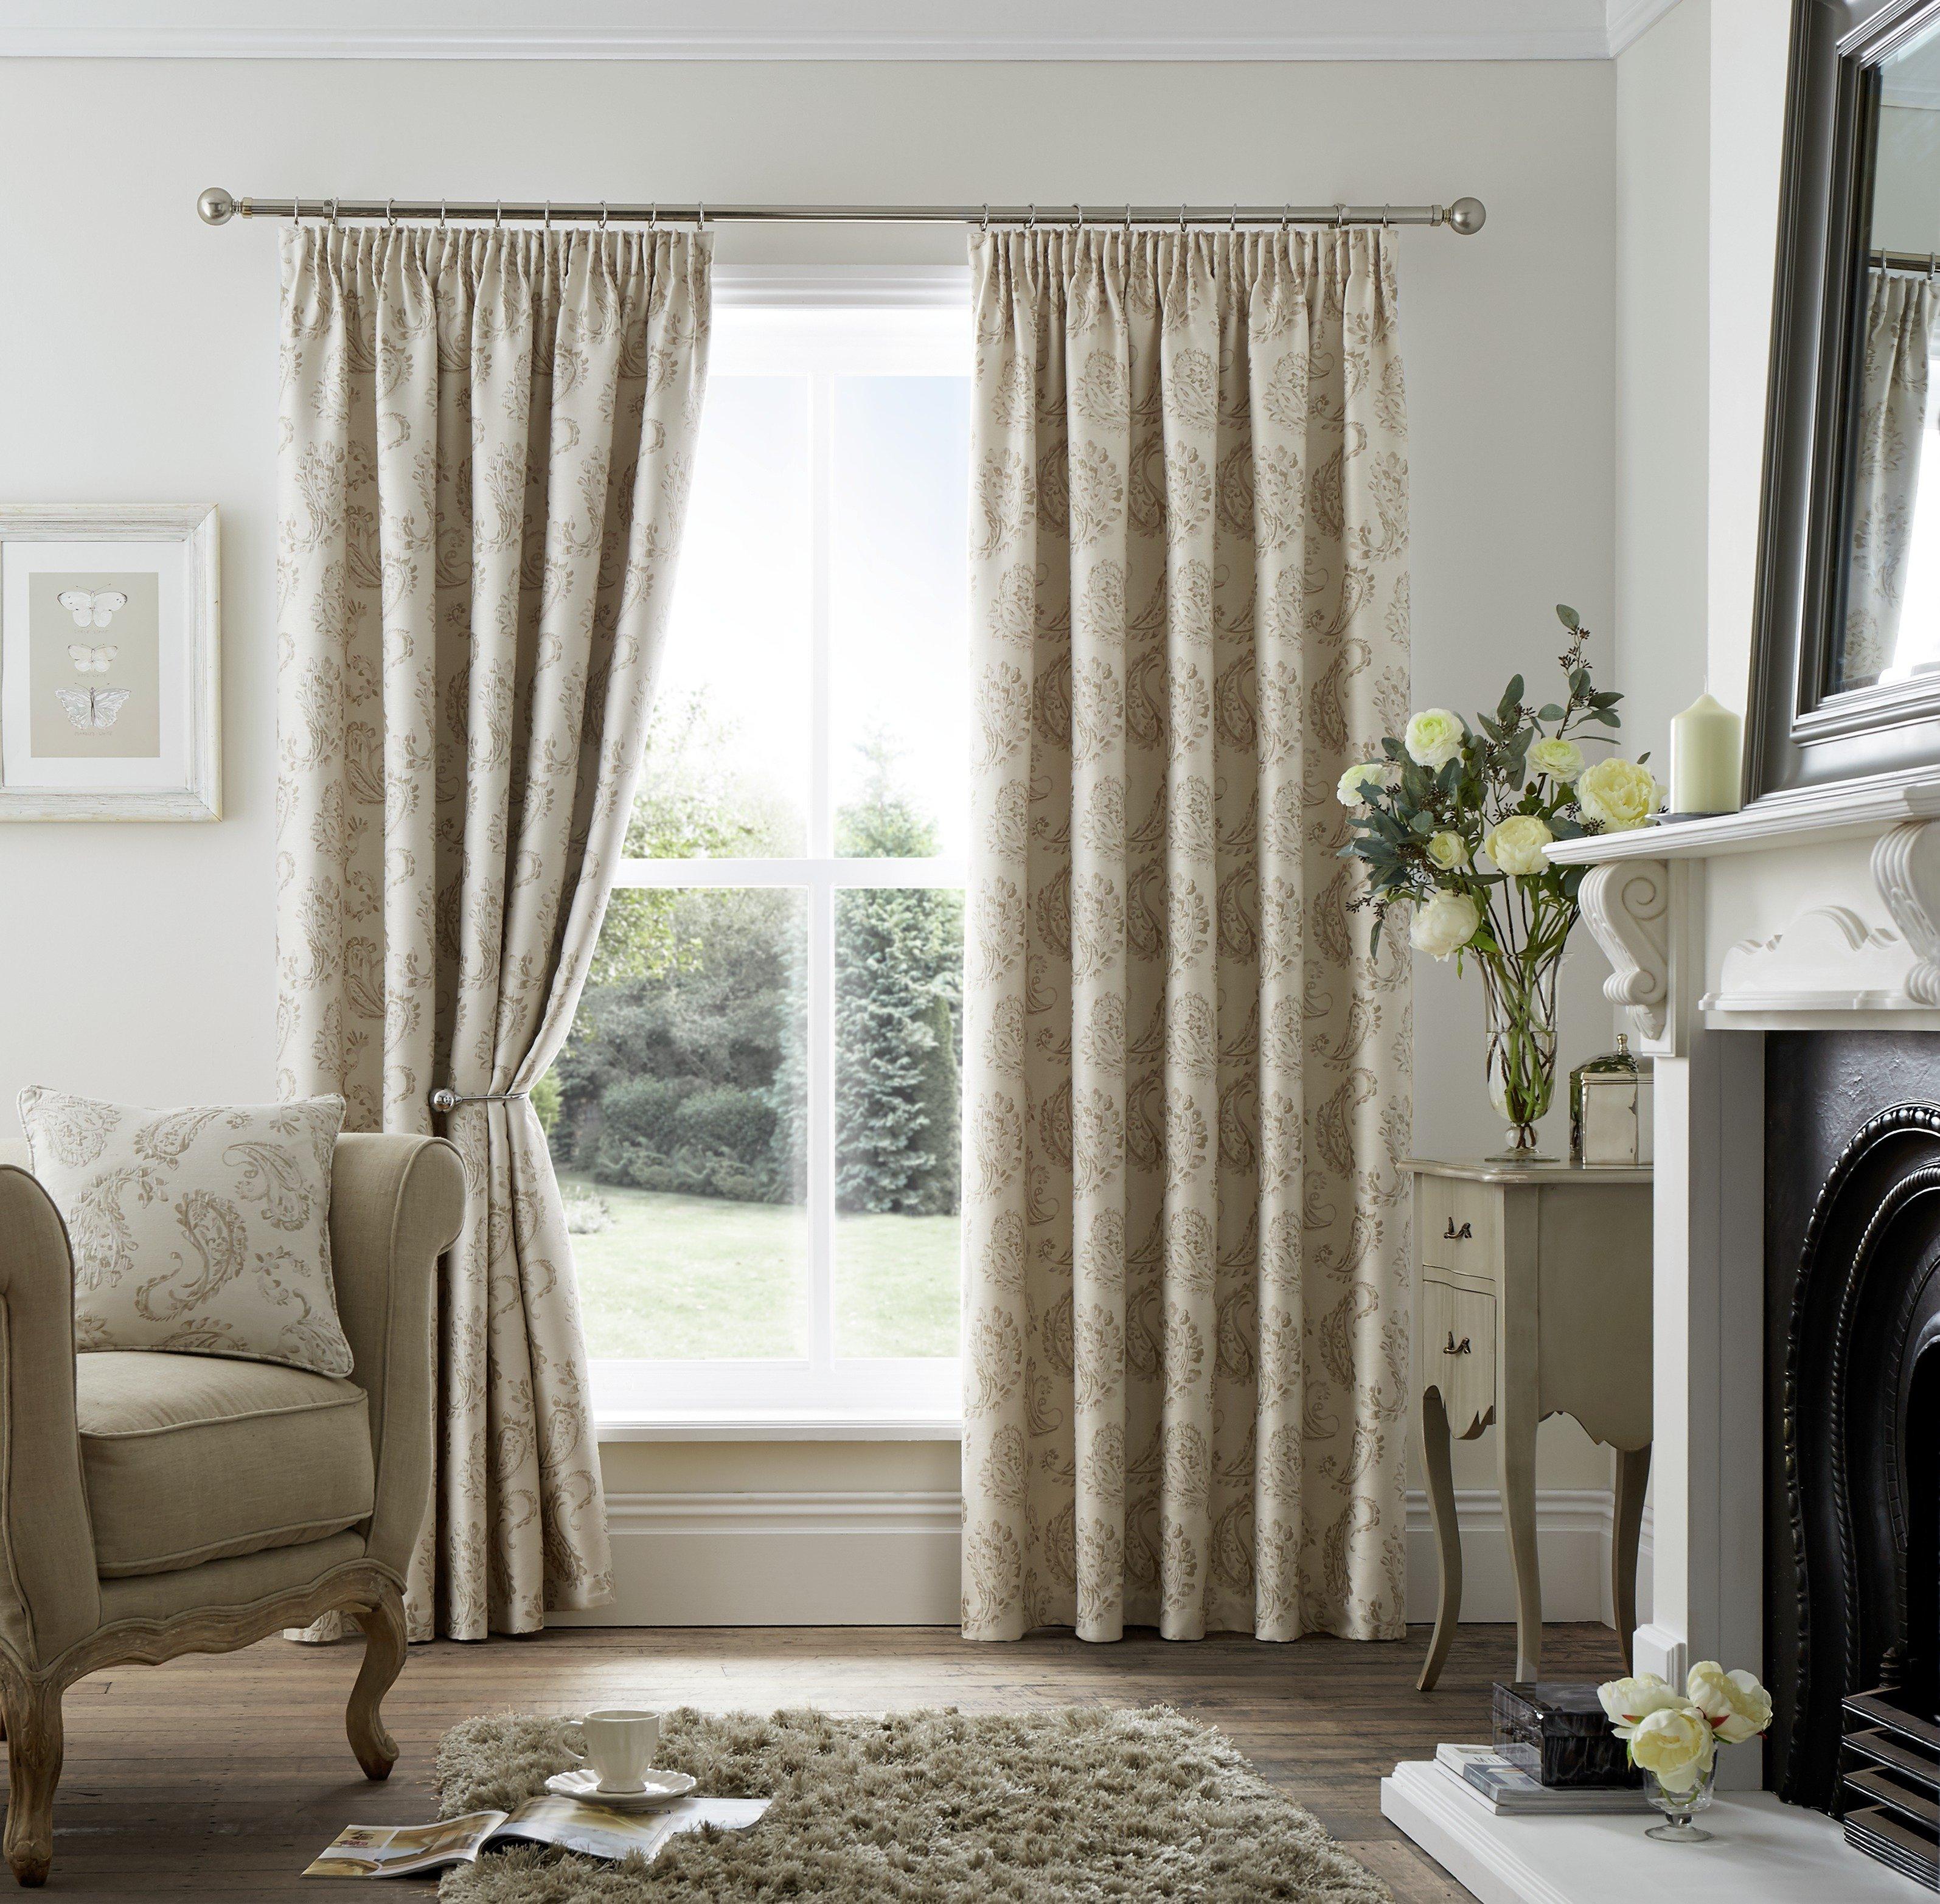 curtina-ashford-lined-curtains-229x229cm-natural